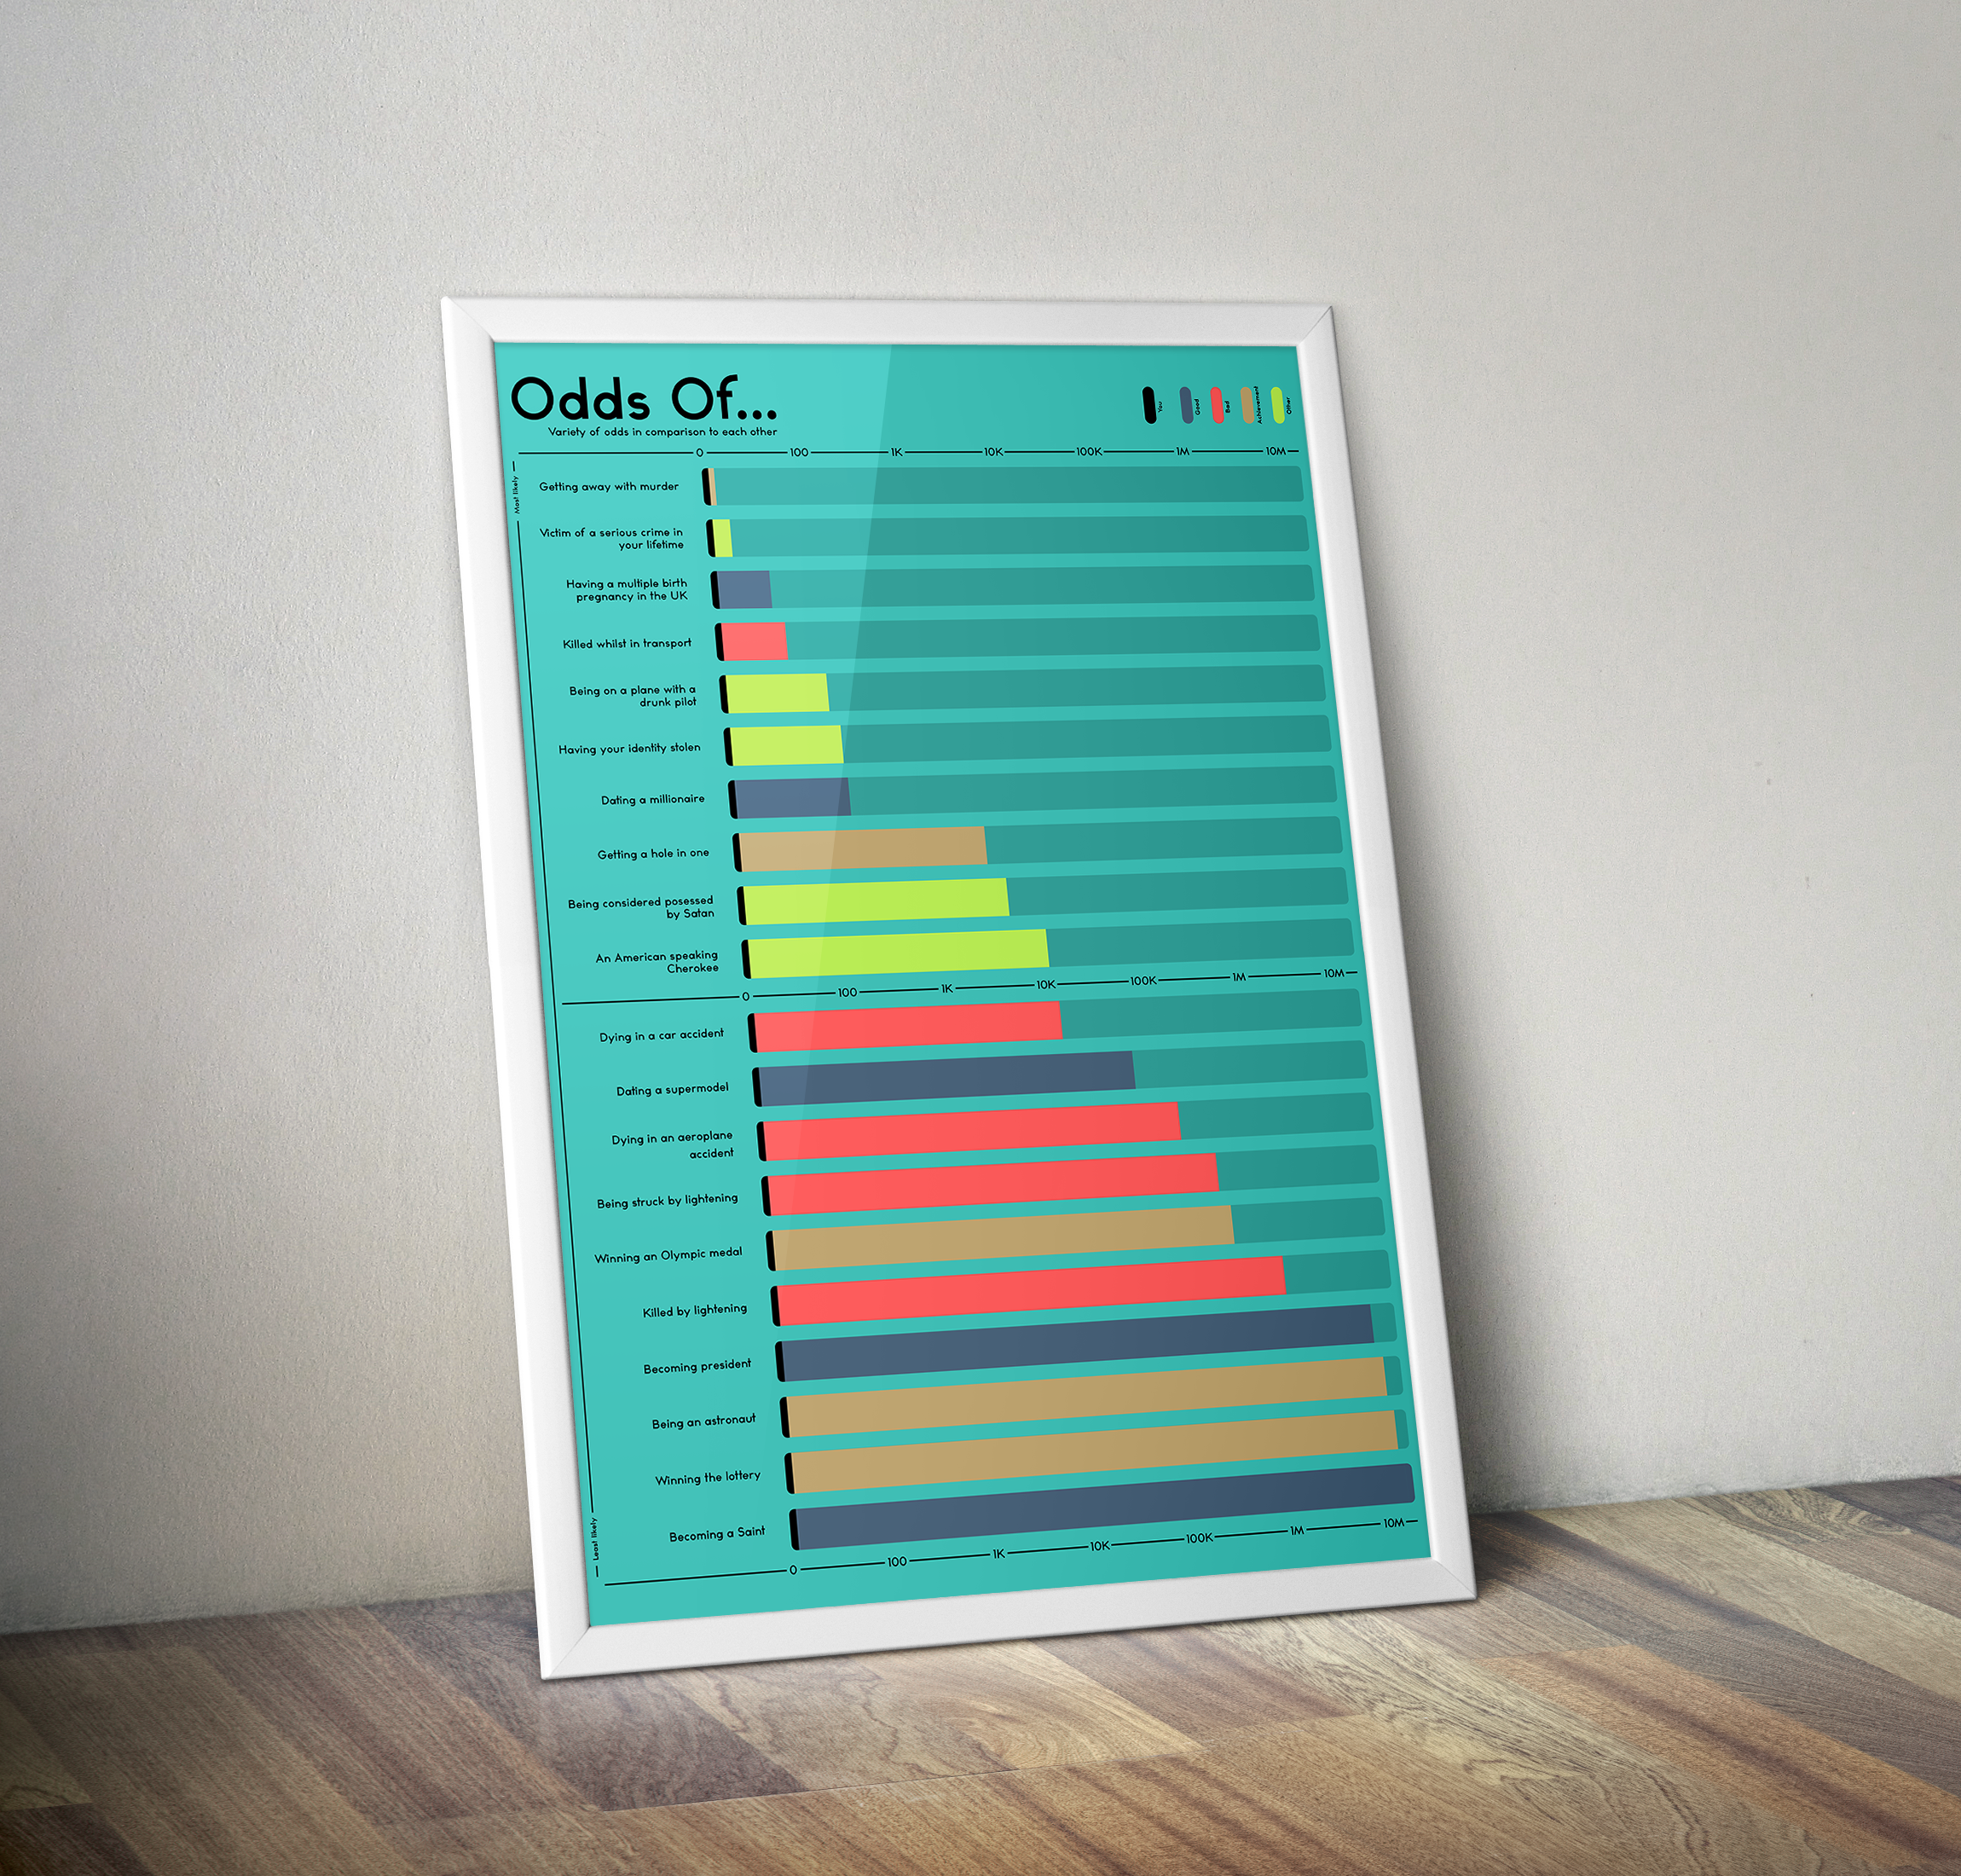 Jacob James - Odds Of    - Data translation